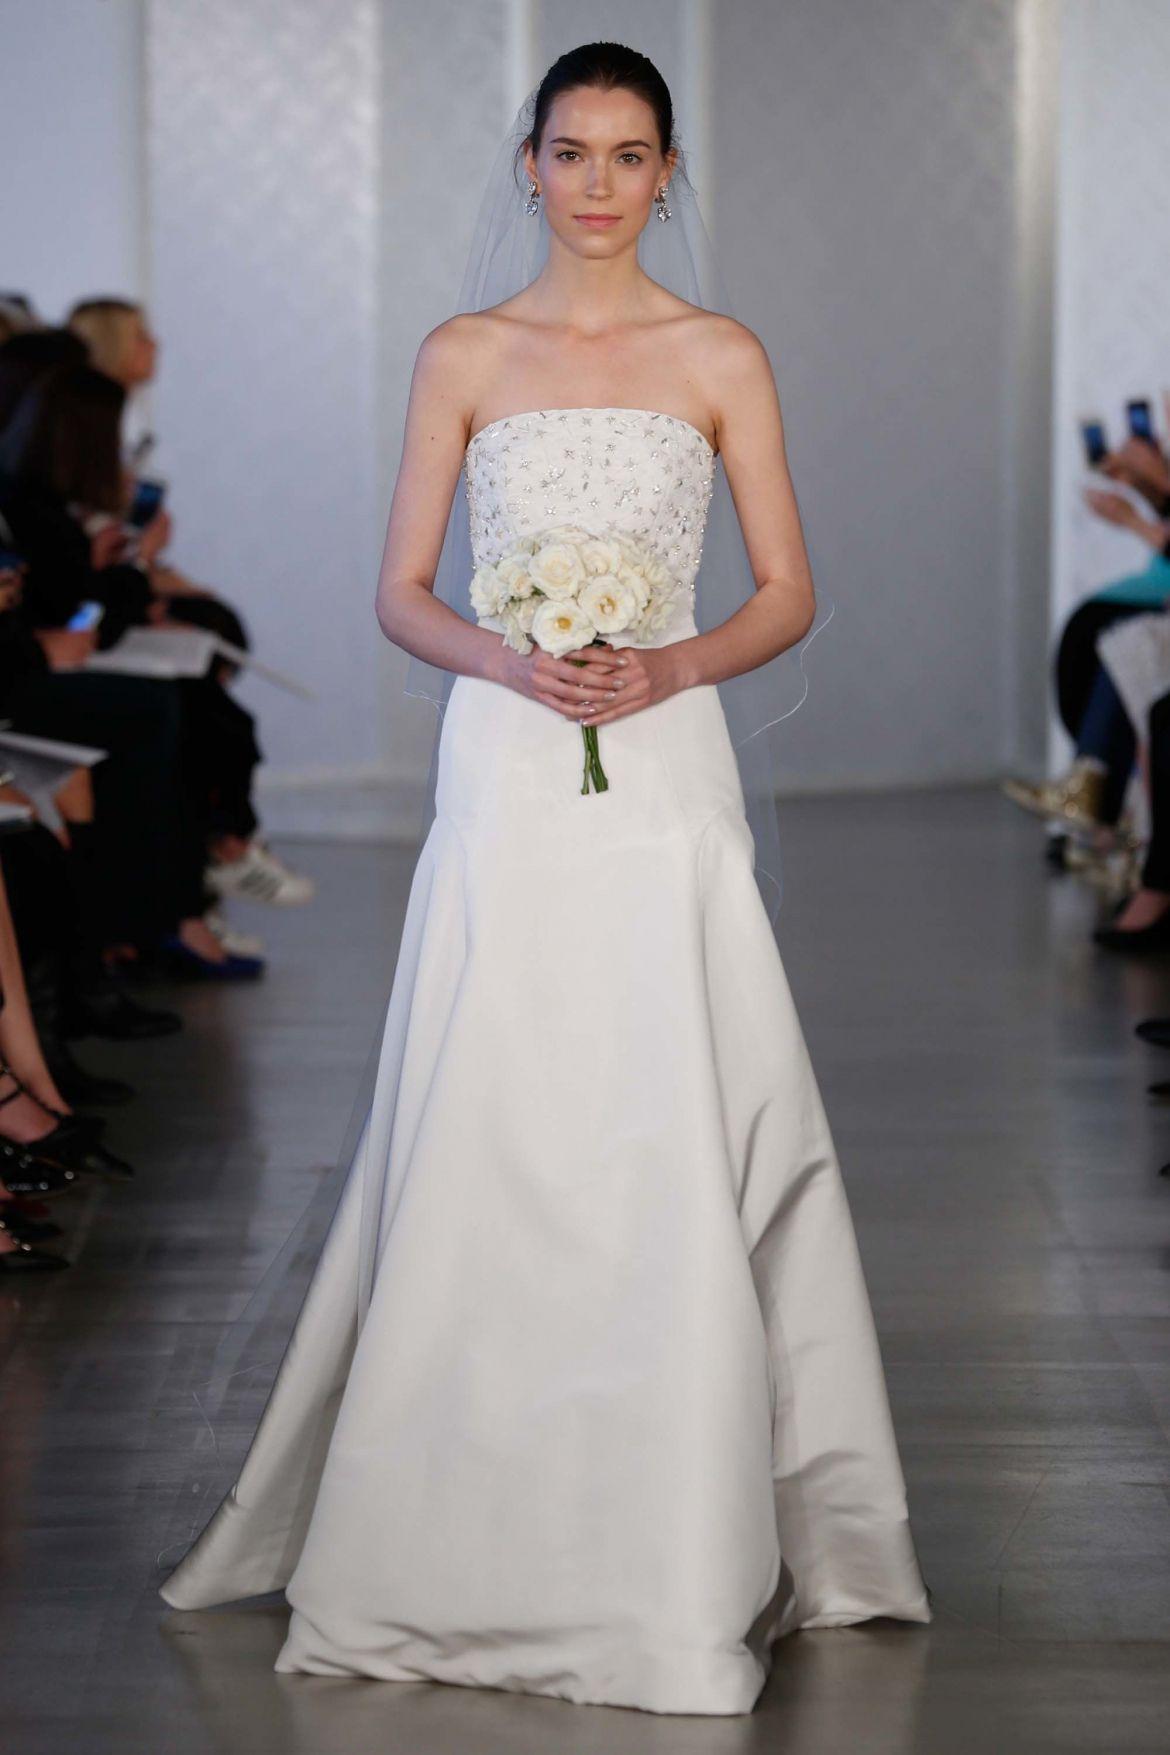 99 Oscar De La A Wedding Dress Cost Country Dresses For Weddings Check More